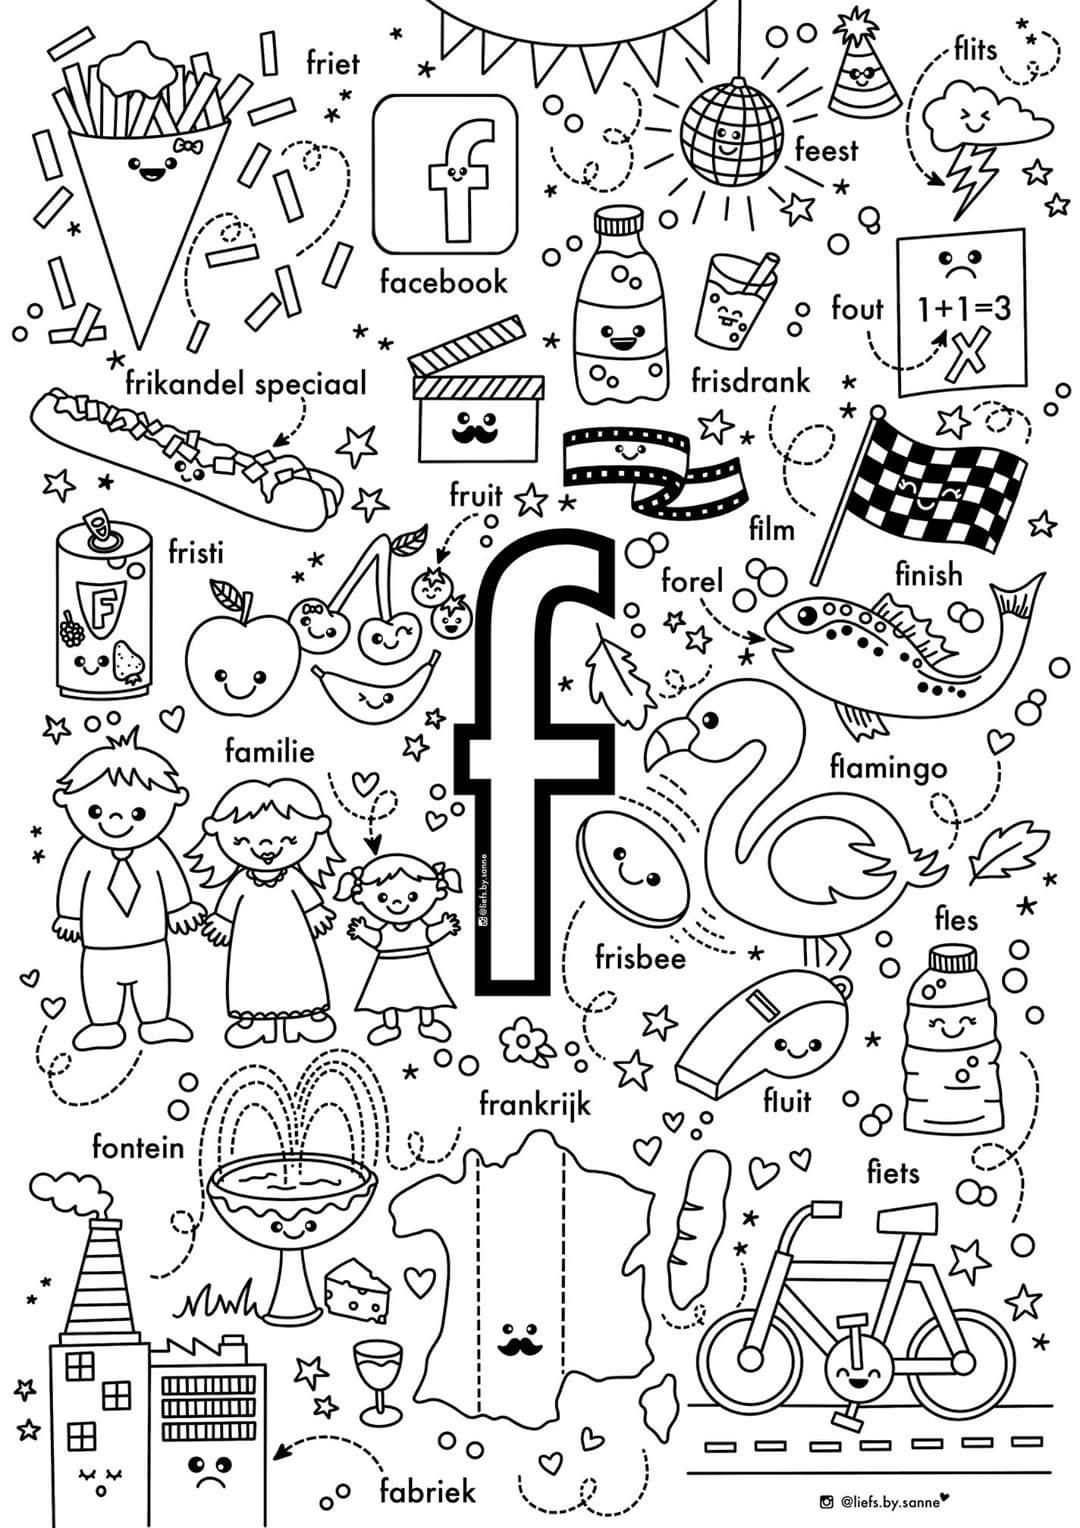 F Woorden Kleurplaat In 2020 Letterherkenning Spelletjes Letterherkenning Alfabet Boek